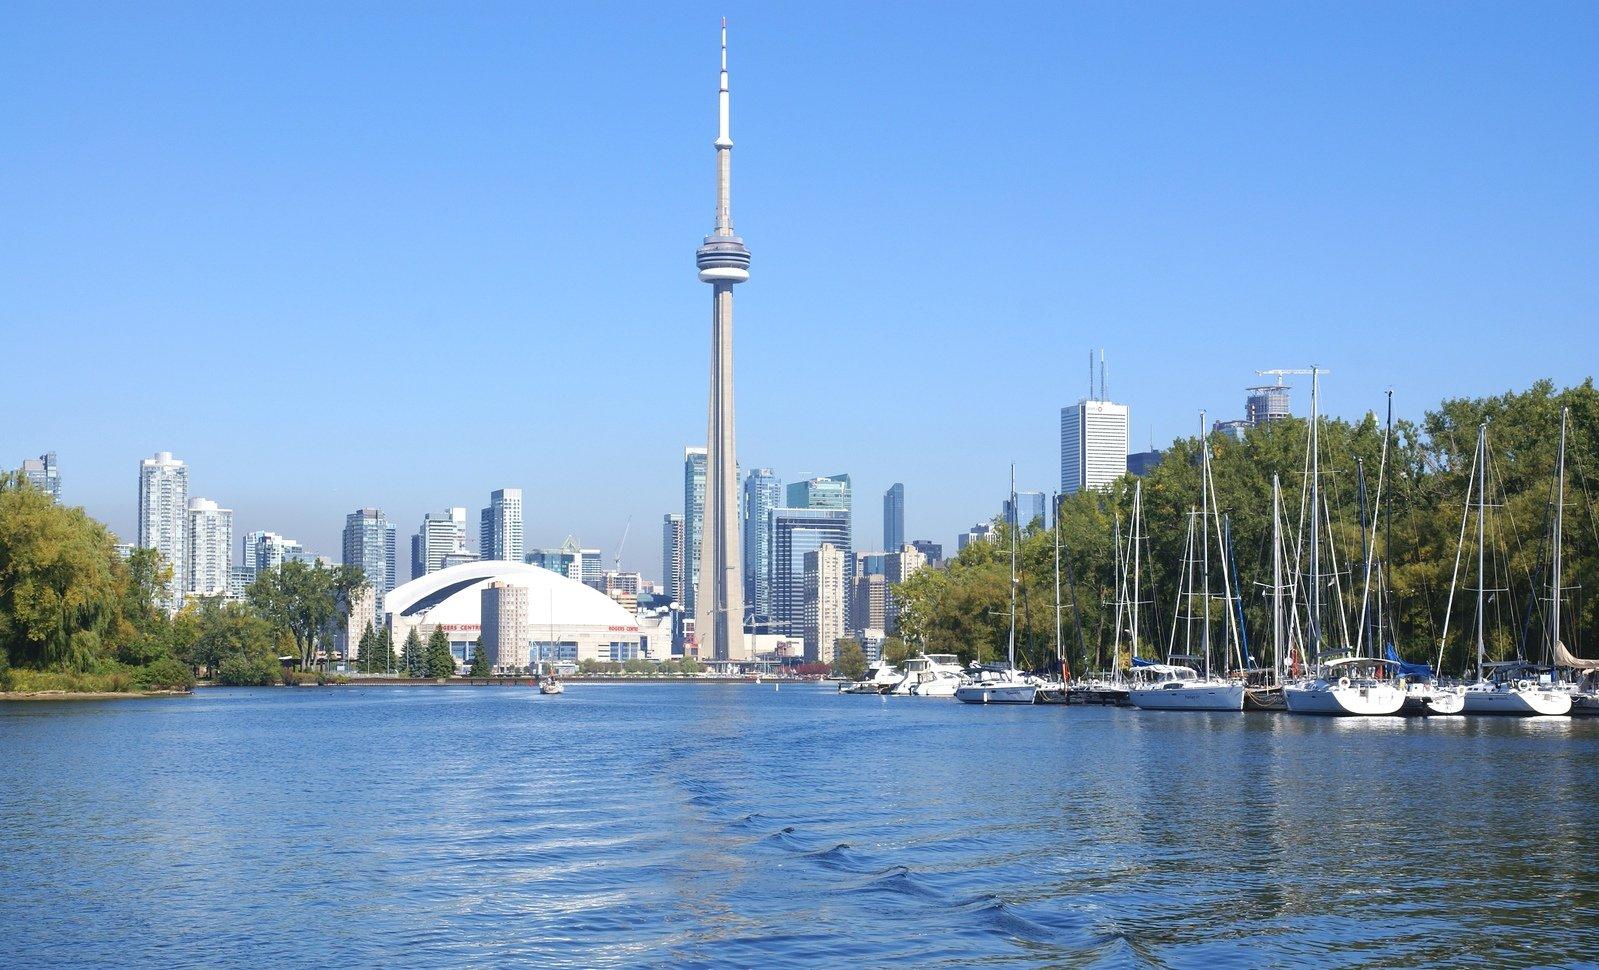 Mandatory Registration for Toronto Short-Term Rental Units